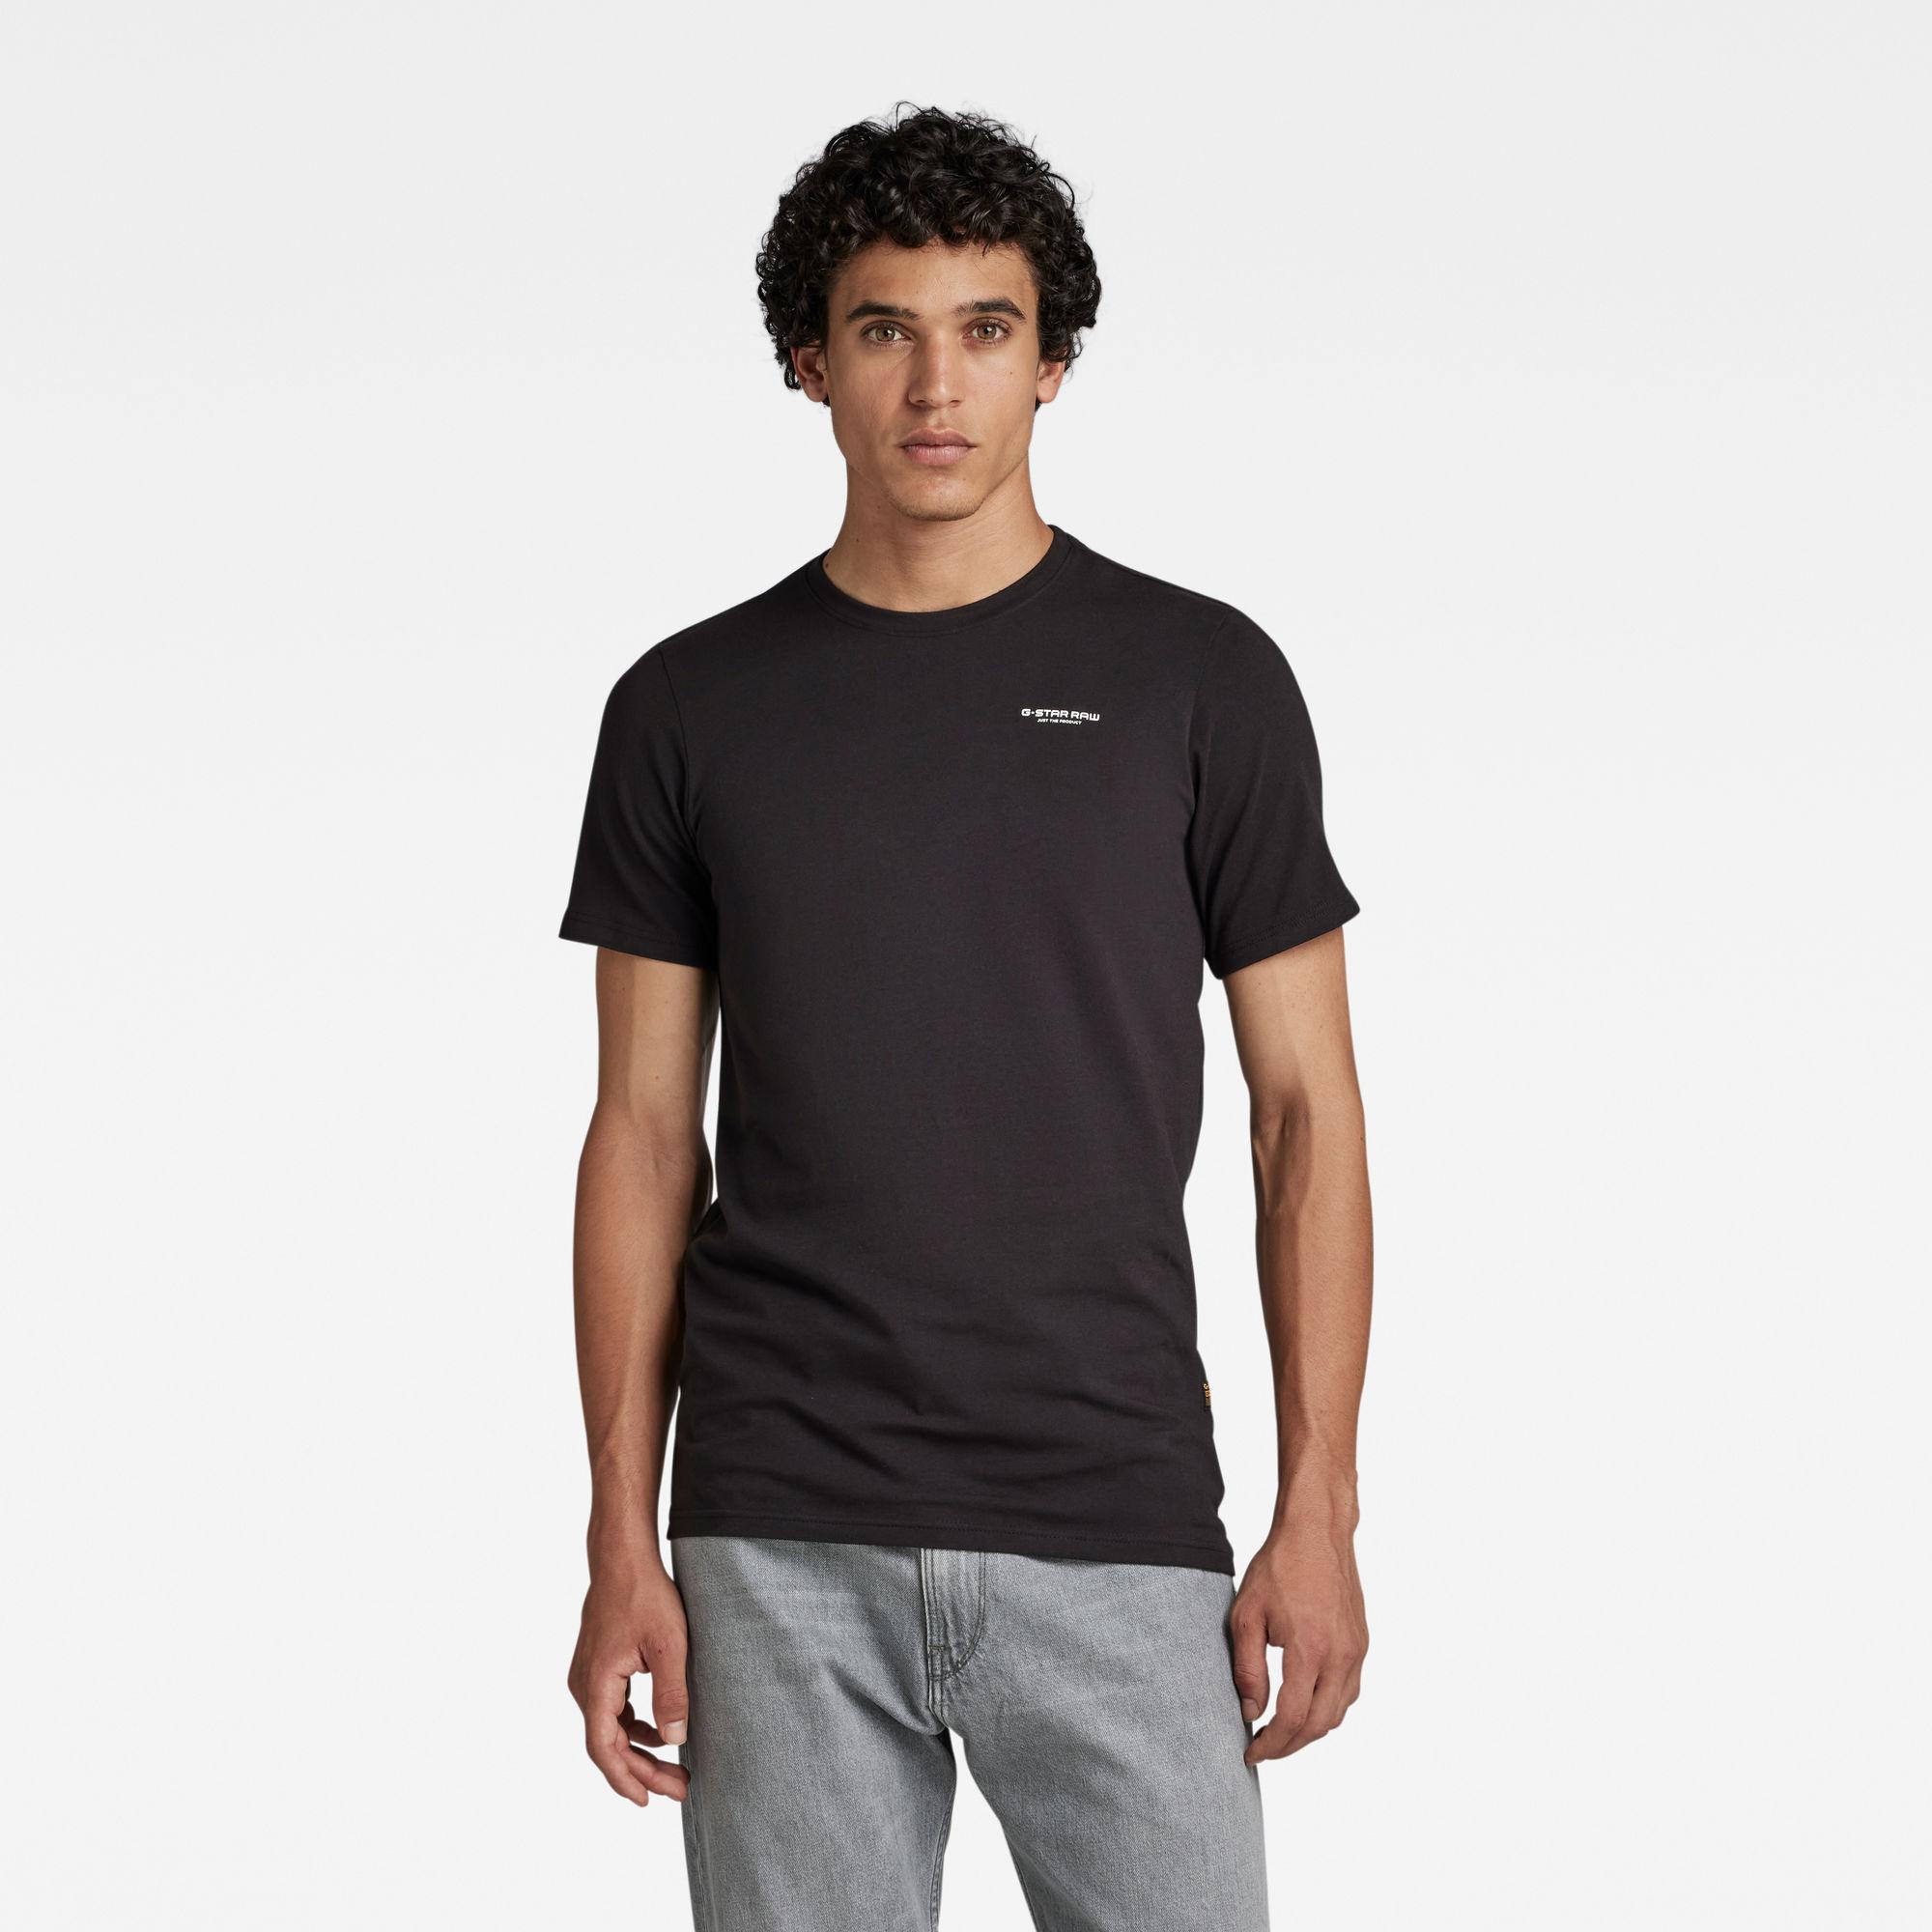 G-Star RAW Heren Slim Base T-Shirt Zwart